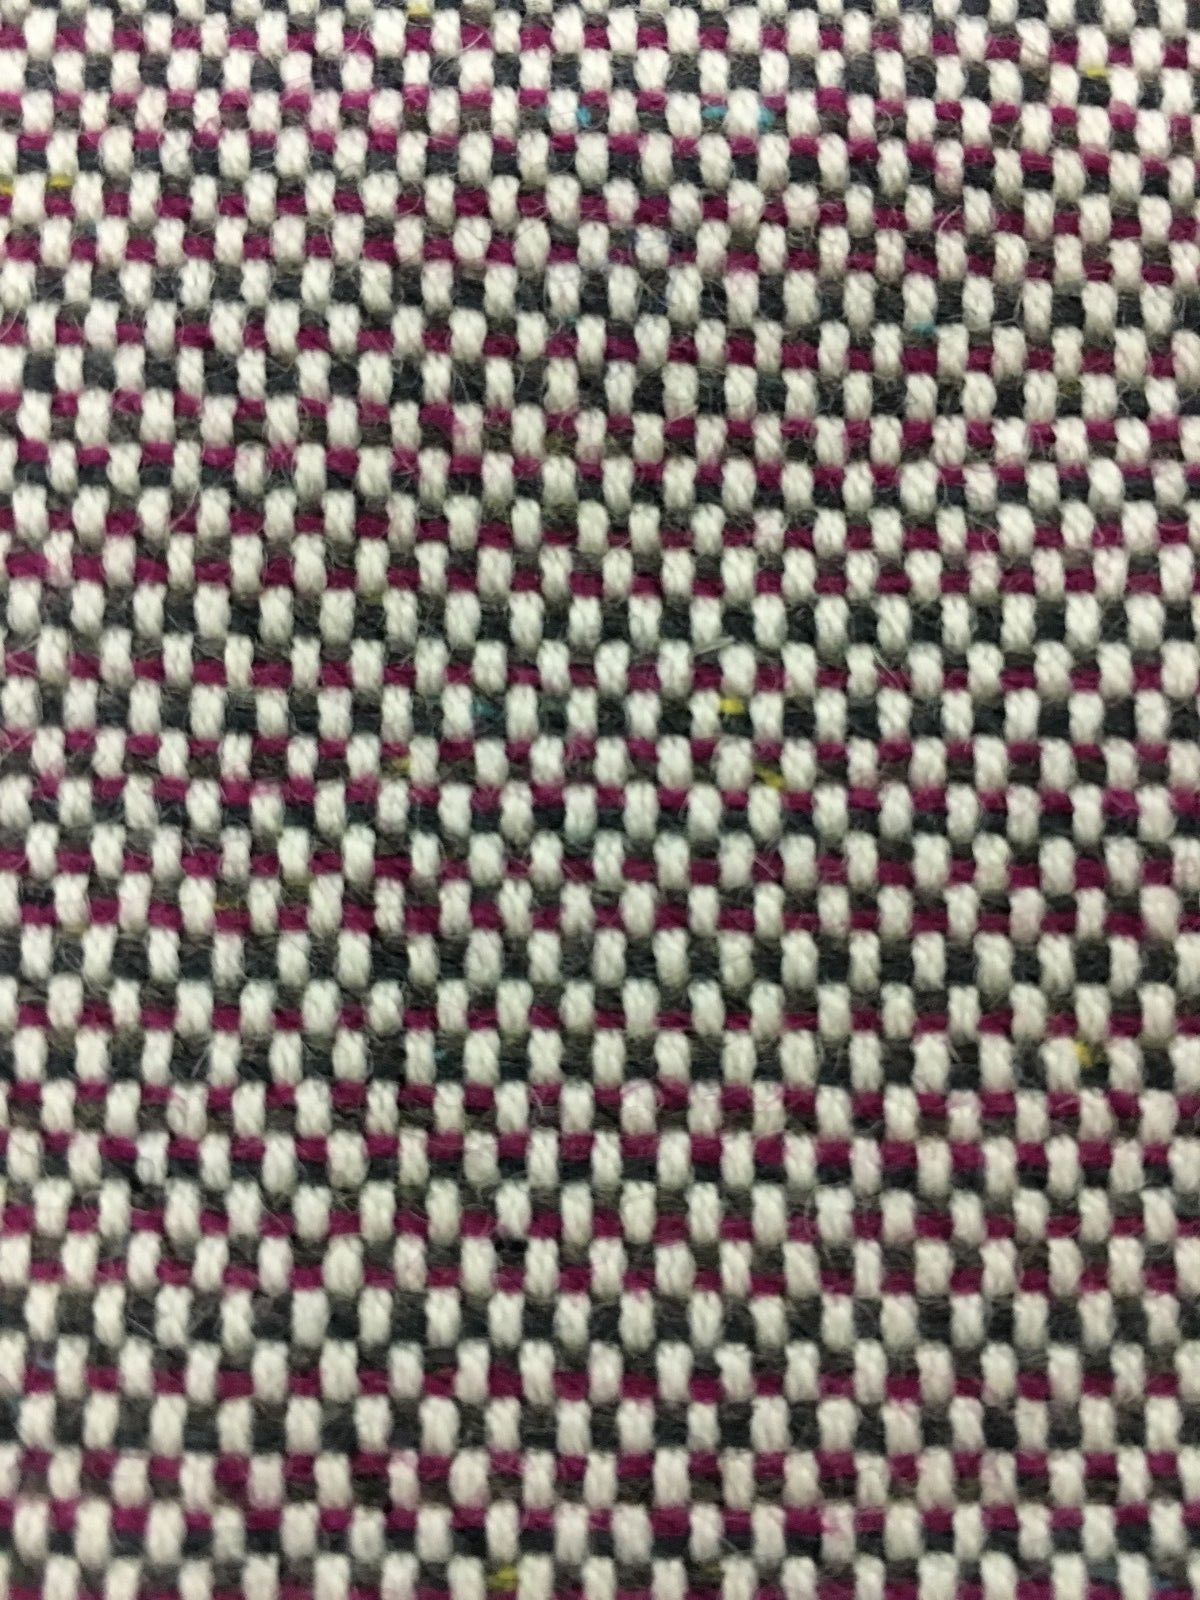 Geiger Upholstery Fabric Mid Century Wool Tweed Ruby 4.75 yds 16603 - P